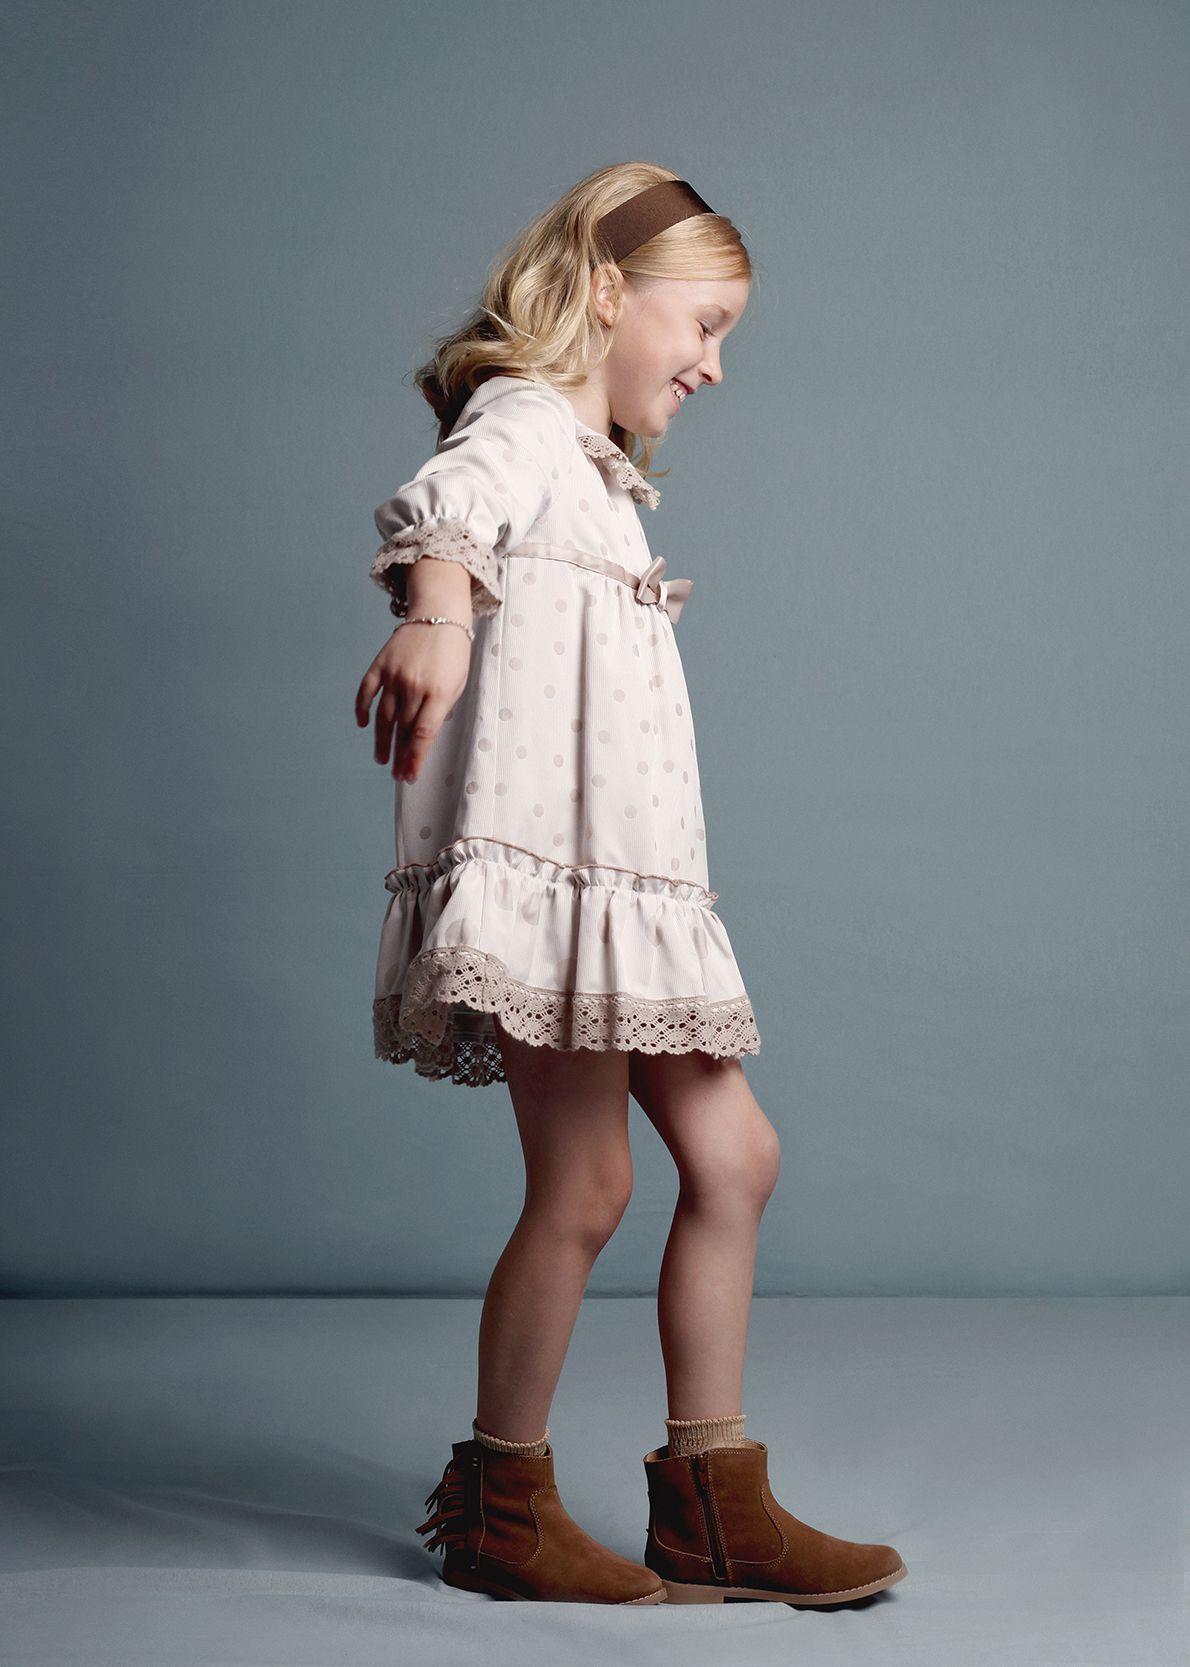 75d1a9097  vestidosdeniña  modainfantil  ropainfantil  kidsfashion  madeinspain   hechoamano  handmade  fashion